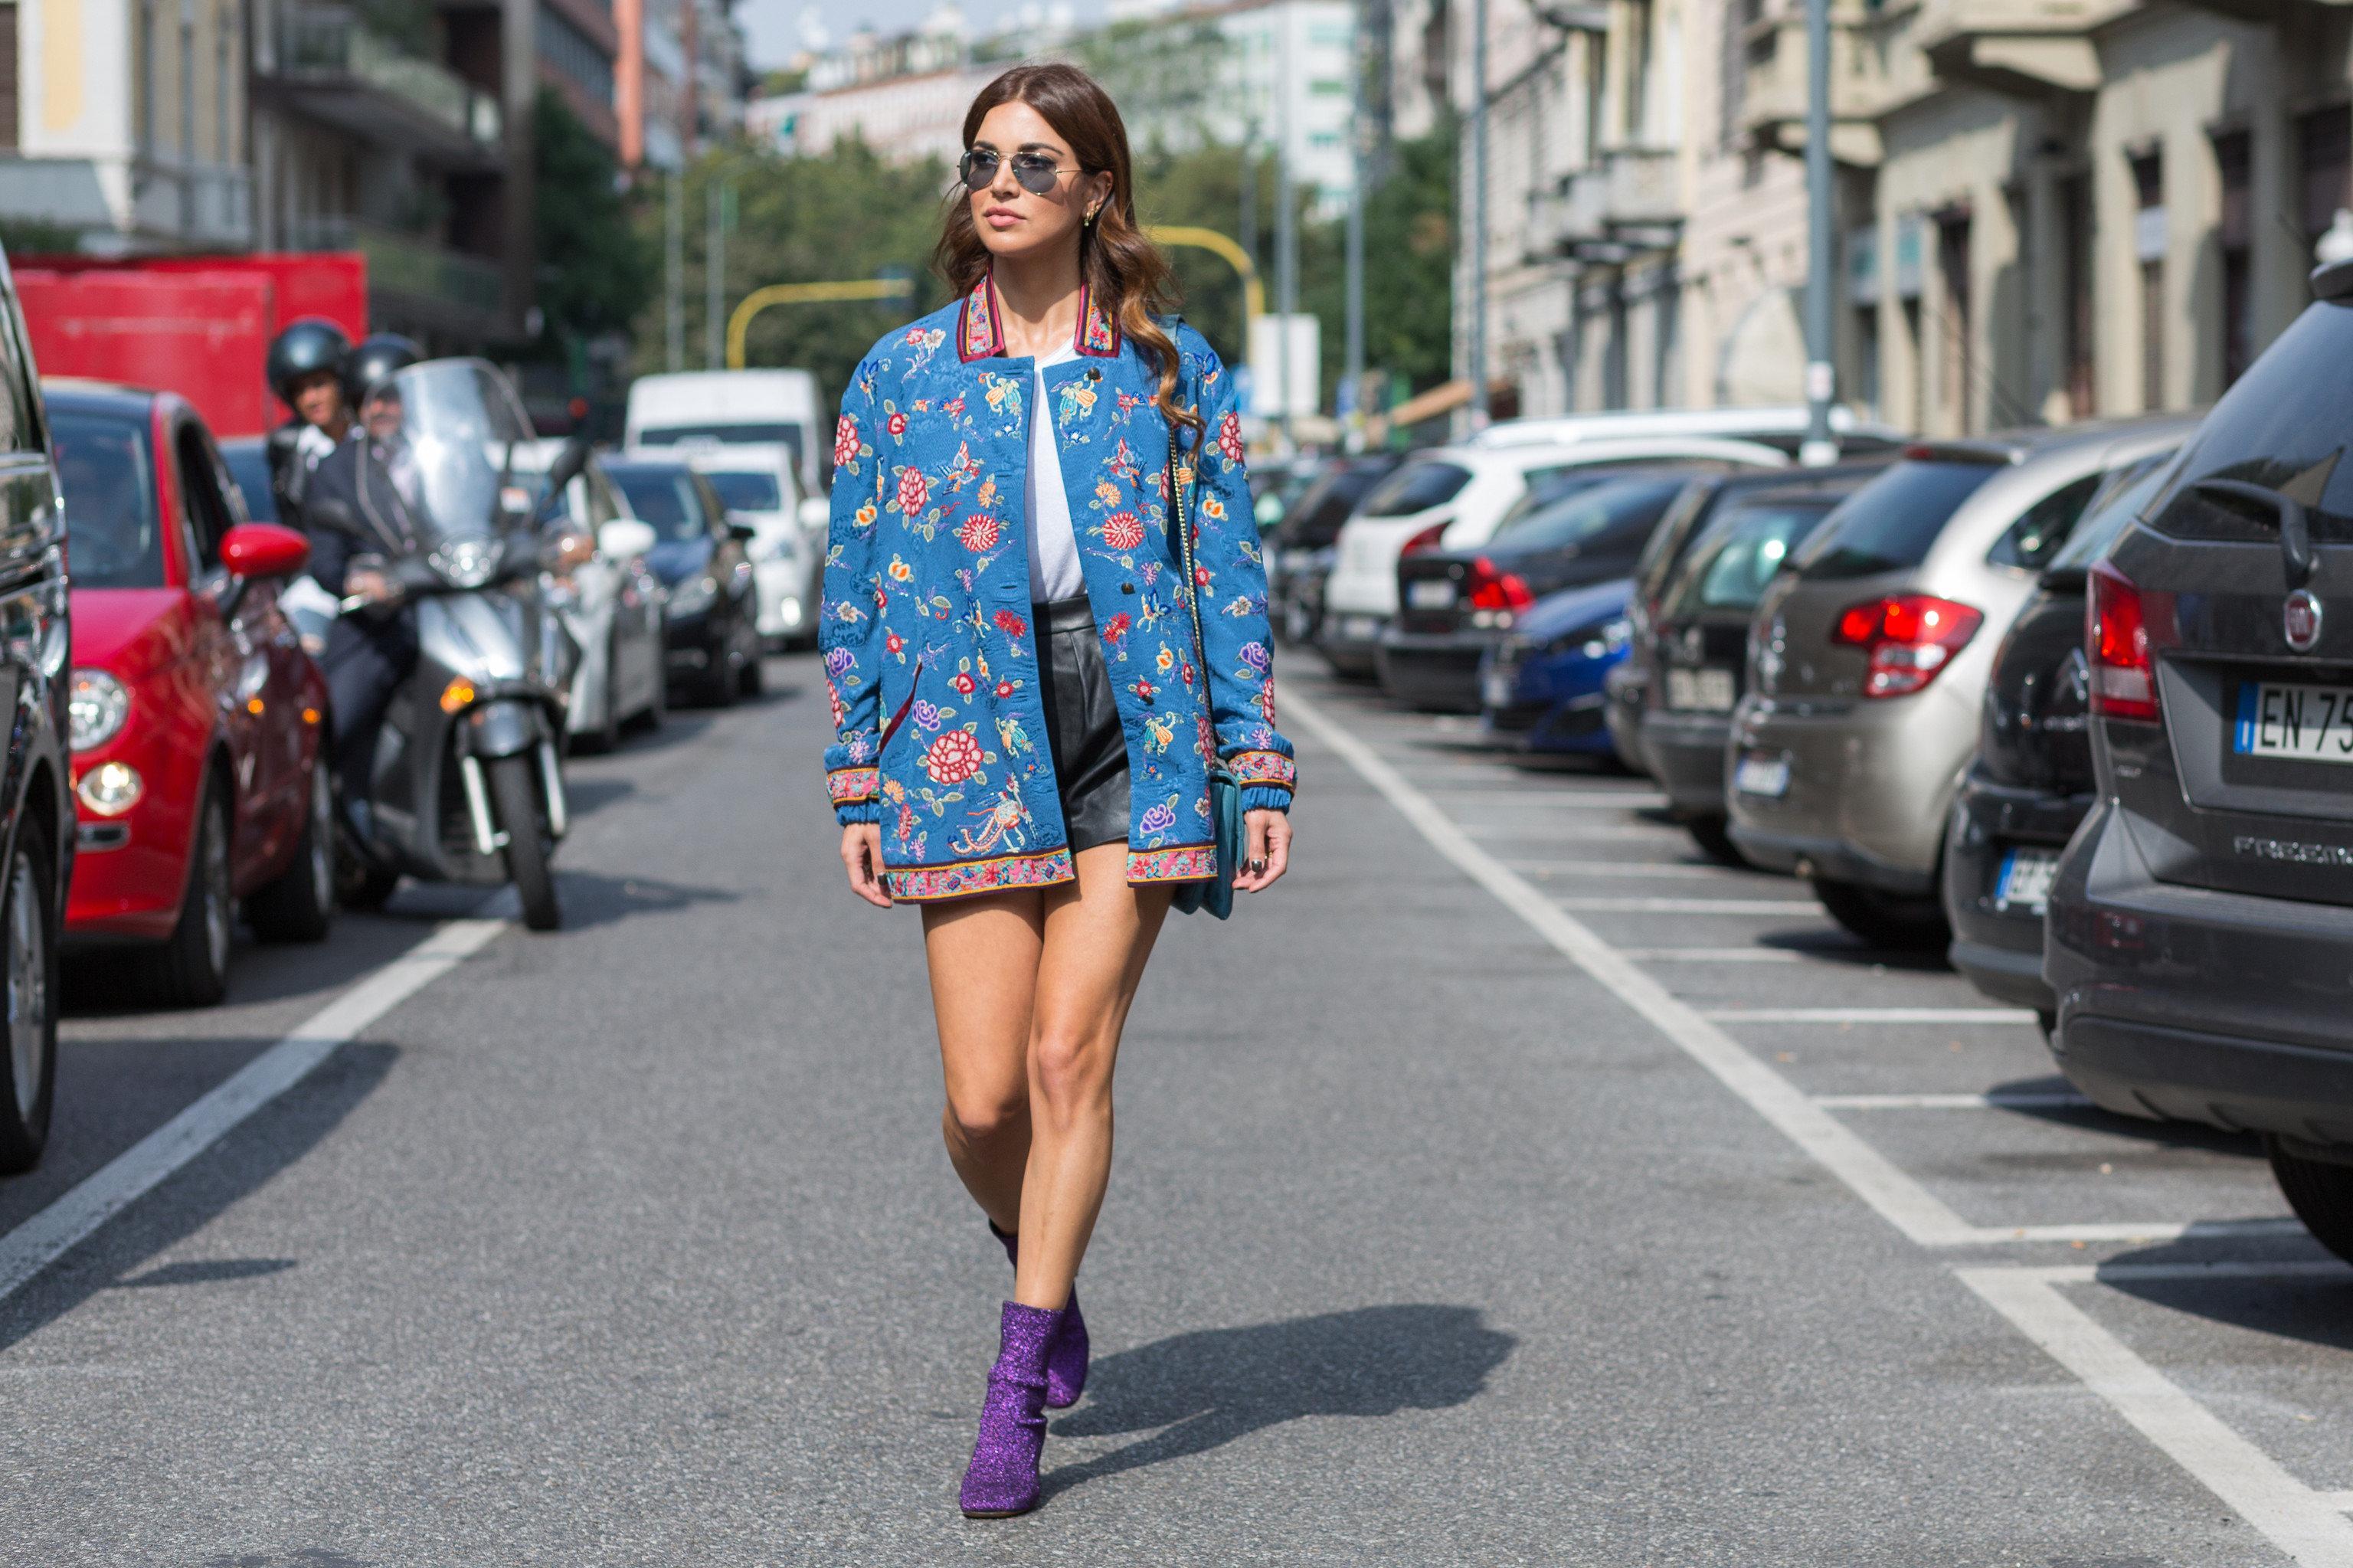 Style + Design Travel Tips footwear road infrastructure denim street jeans fashion snapshot shoe fashion model shoulder shorts socialite recreation walking style girl